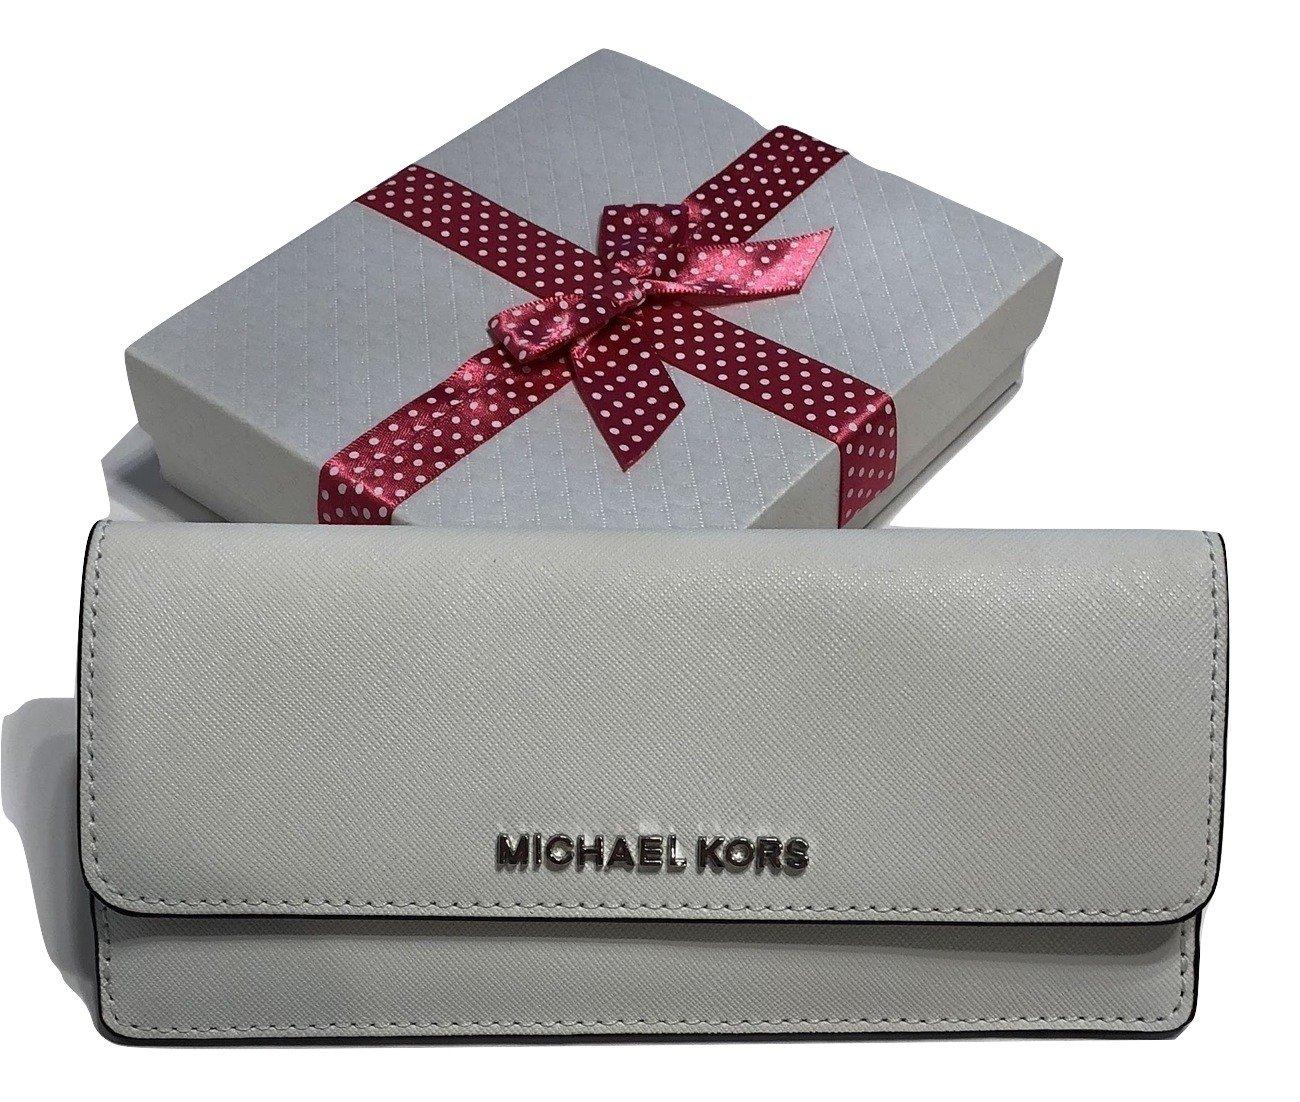 Michael Kors Jet Set Travel Flat Wallet Saffiano Leather (Optic White)